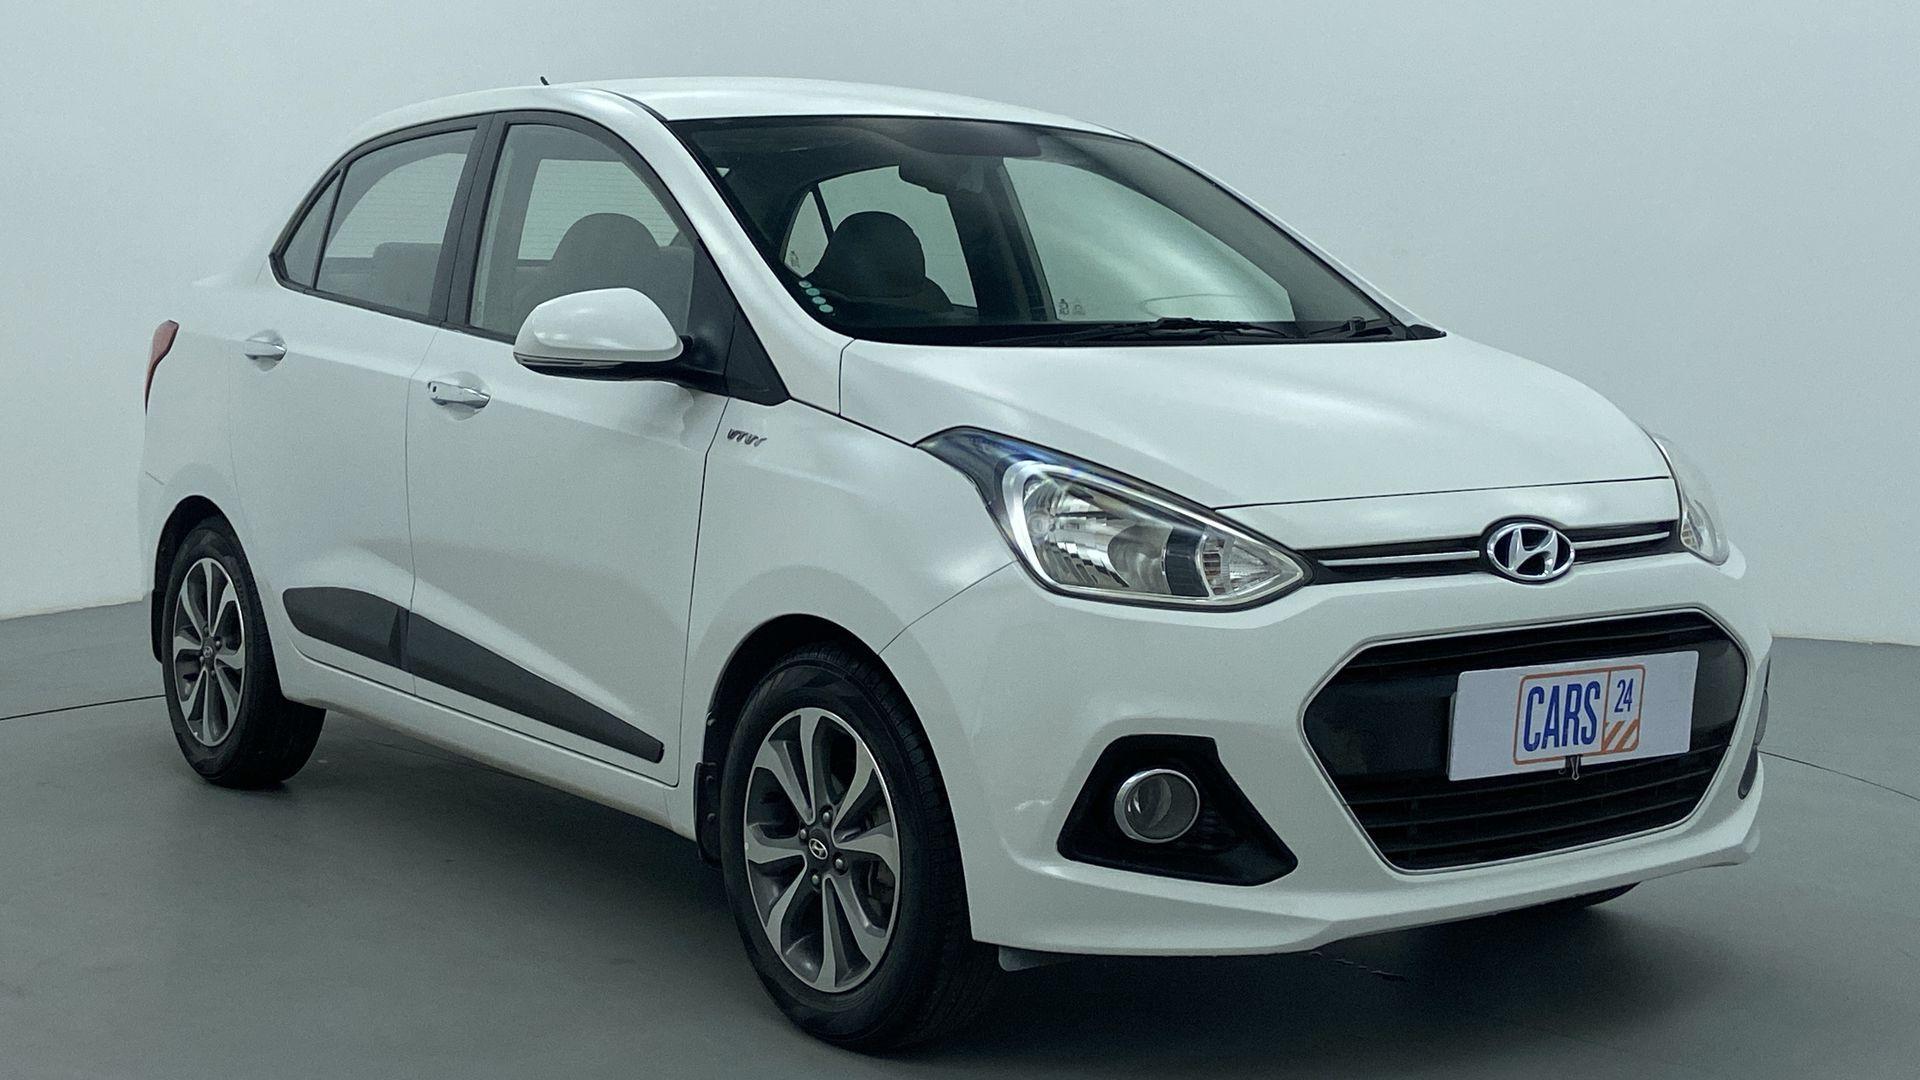 2014 Hyundai Xcent SX 1.2